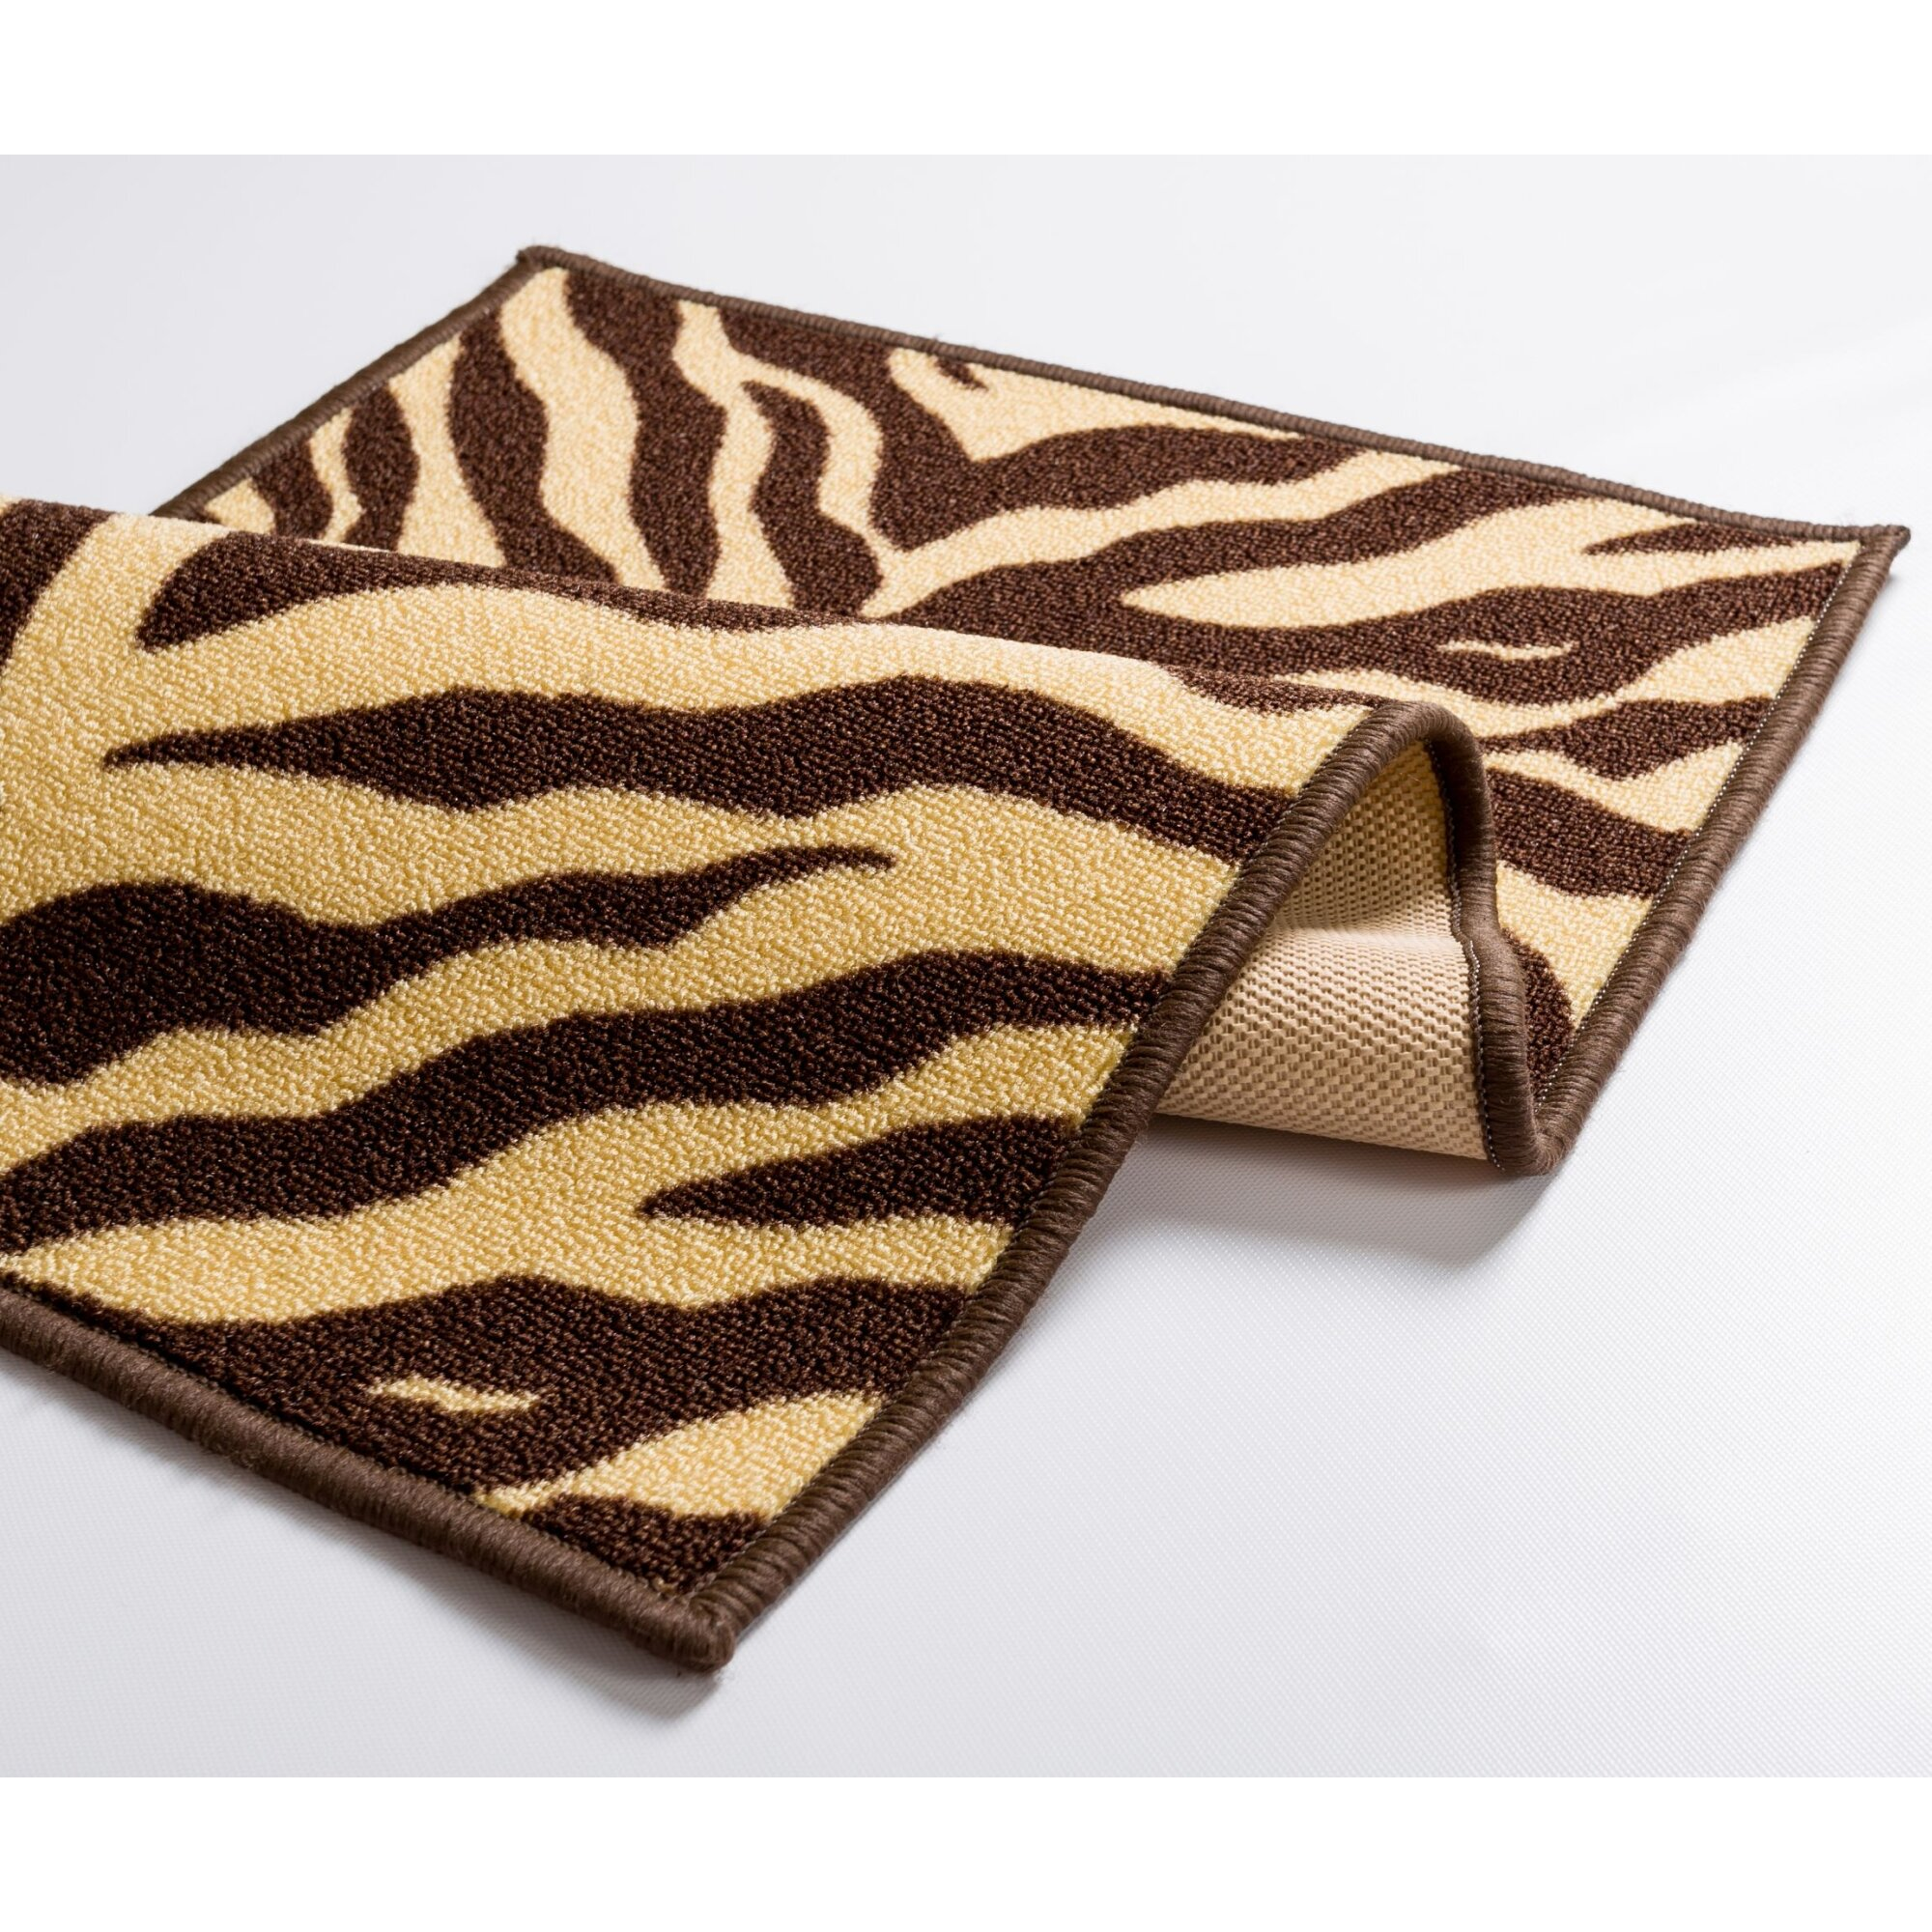 Brown Zebra Print Rug Roselawnlutheran